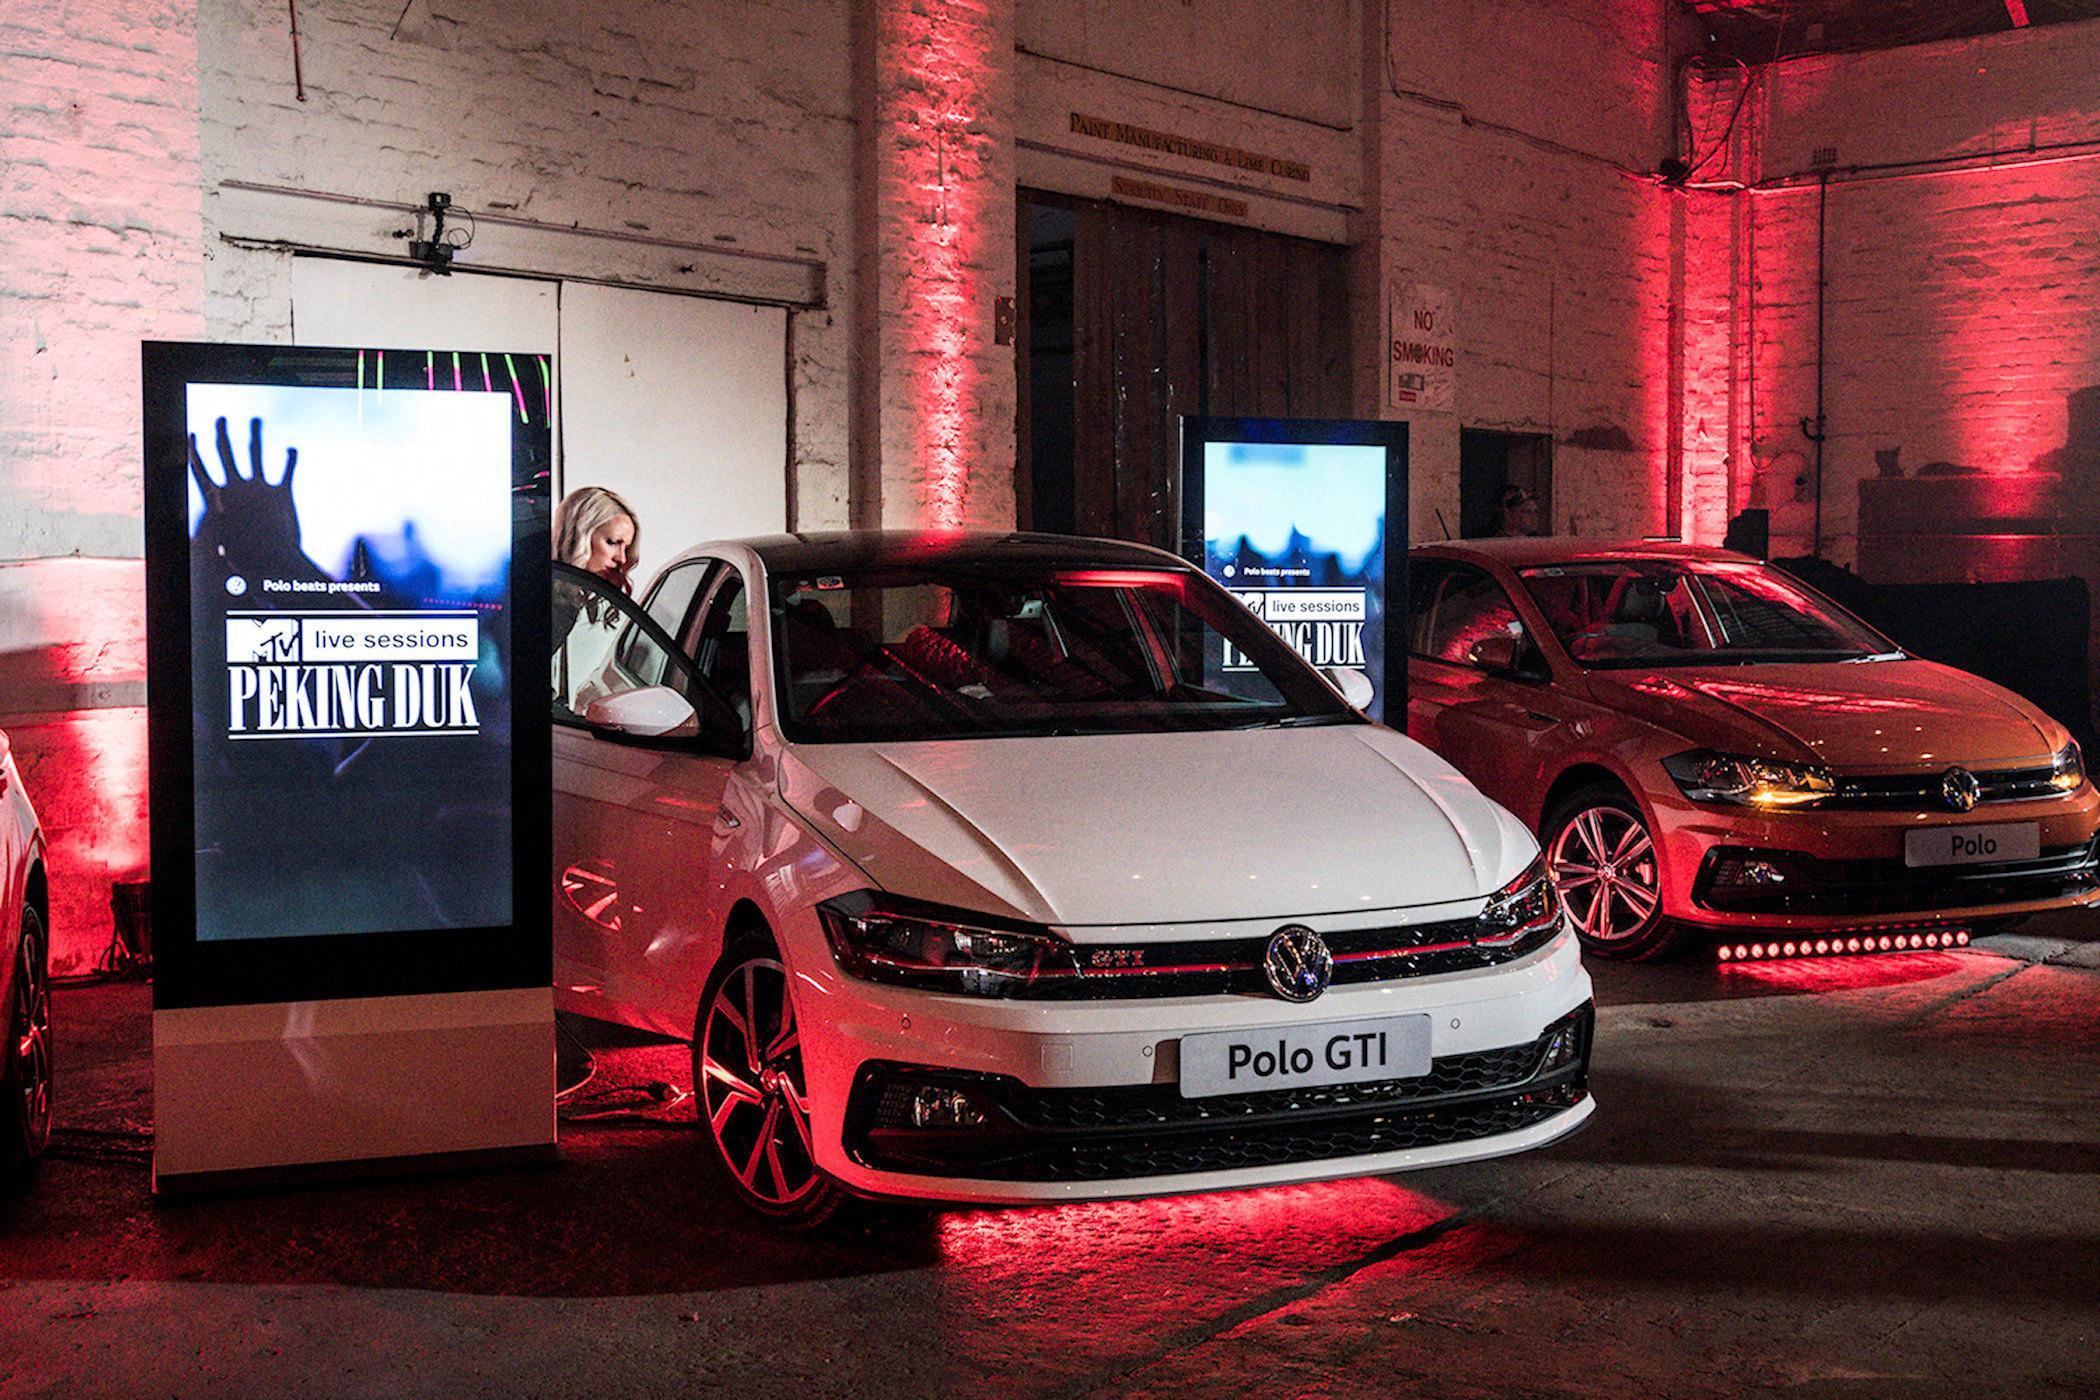 An ultra slim blade interactive kiosk using Zytronic technology in an Australian Volkswagen showroom